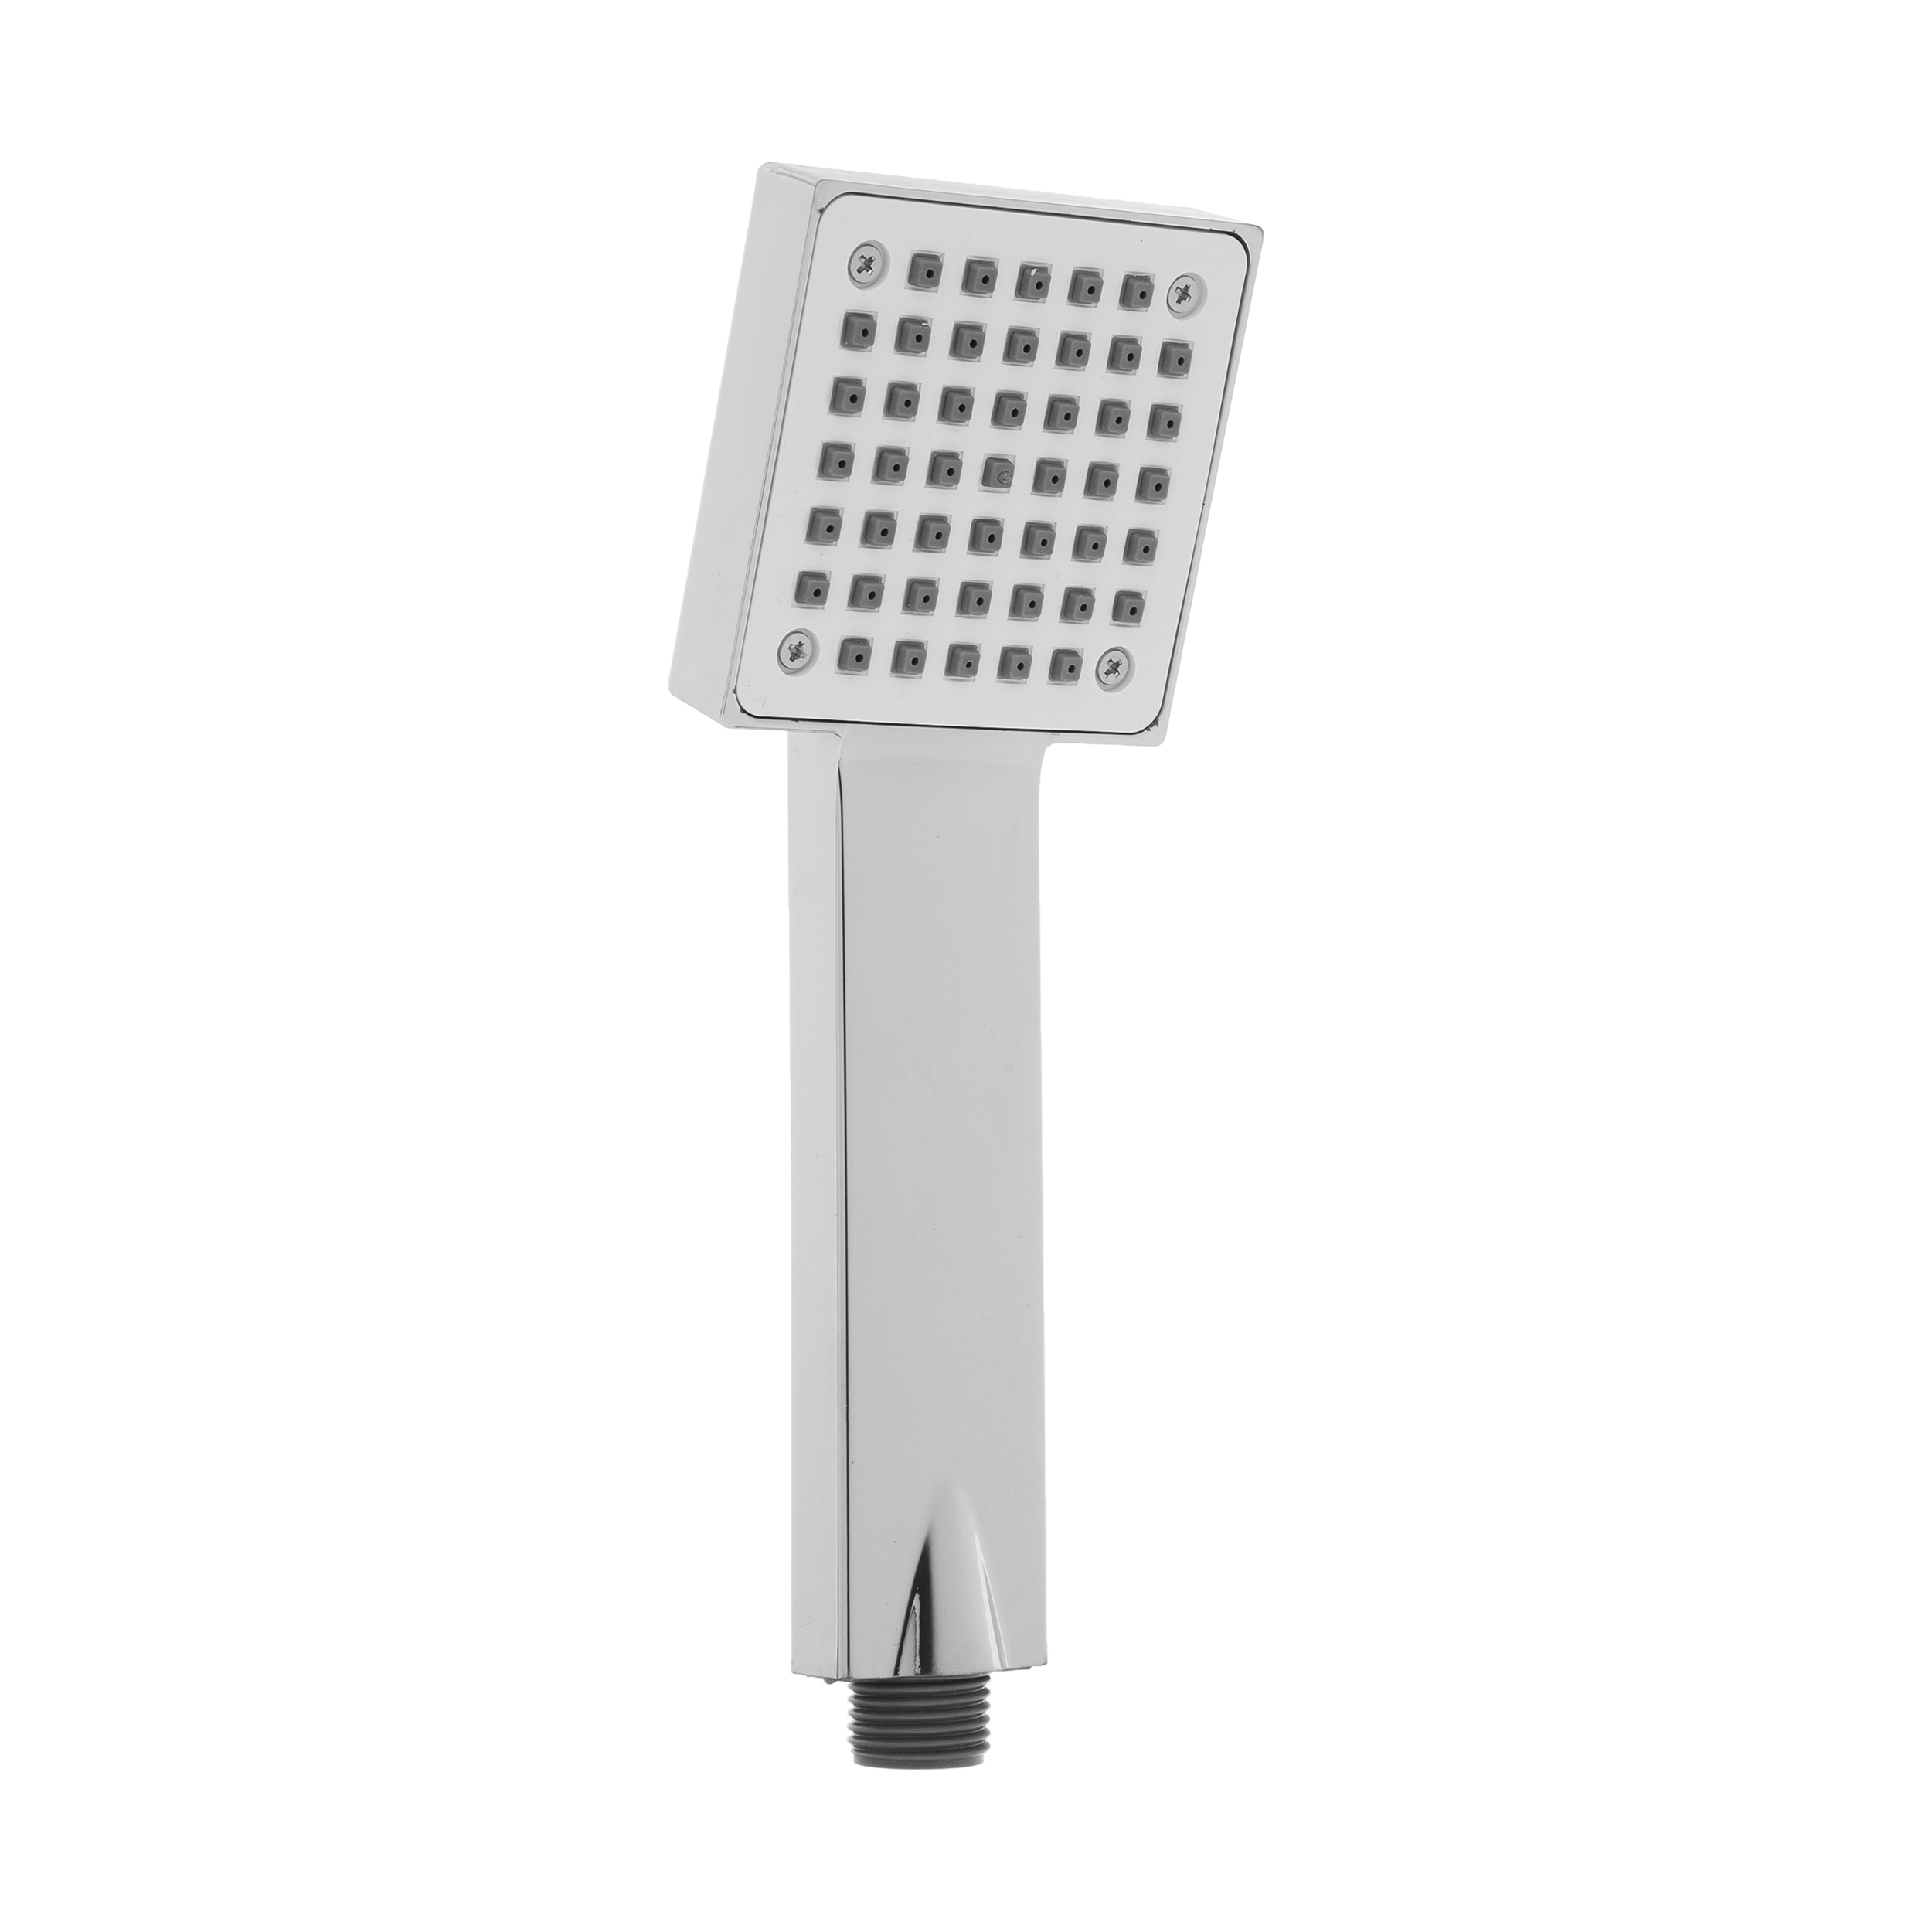 قیمت                                      سردوش حمام سنی پلاستیک مدل لینا کد 02